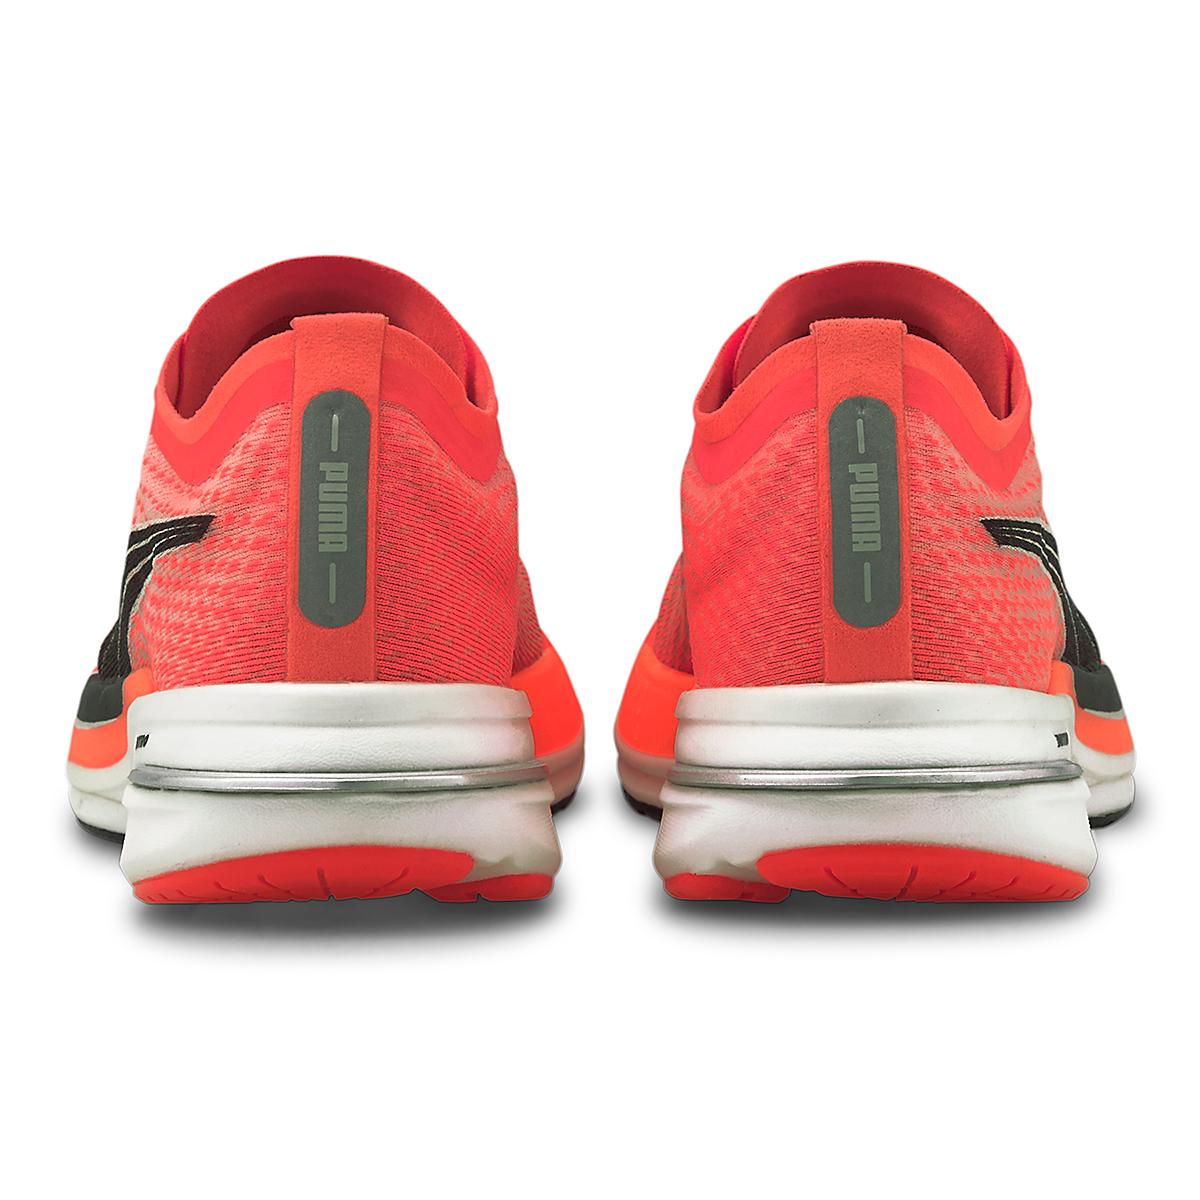 Women's Puma Deviate Nitro Running Shoe - Color: Lava Blast-Puma Black - Size: 5.5 - Width: Regular, Lava Blast-Puma Black, large, image 3